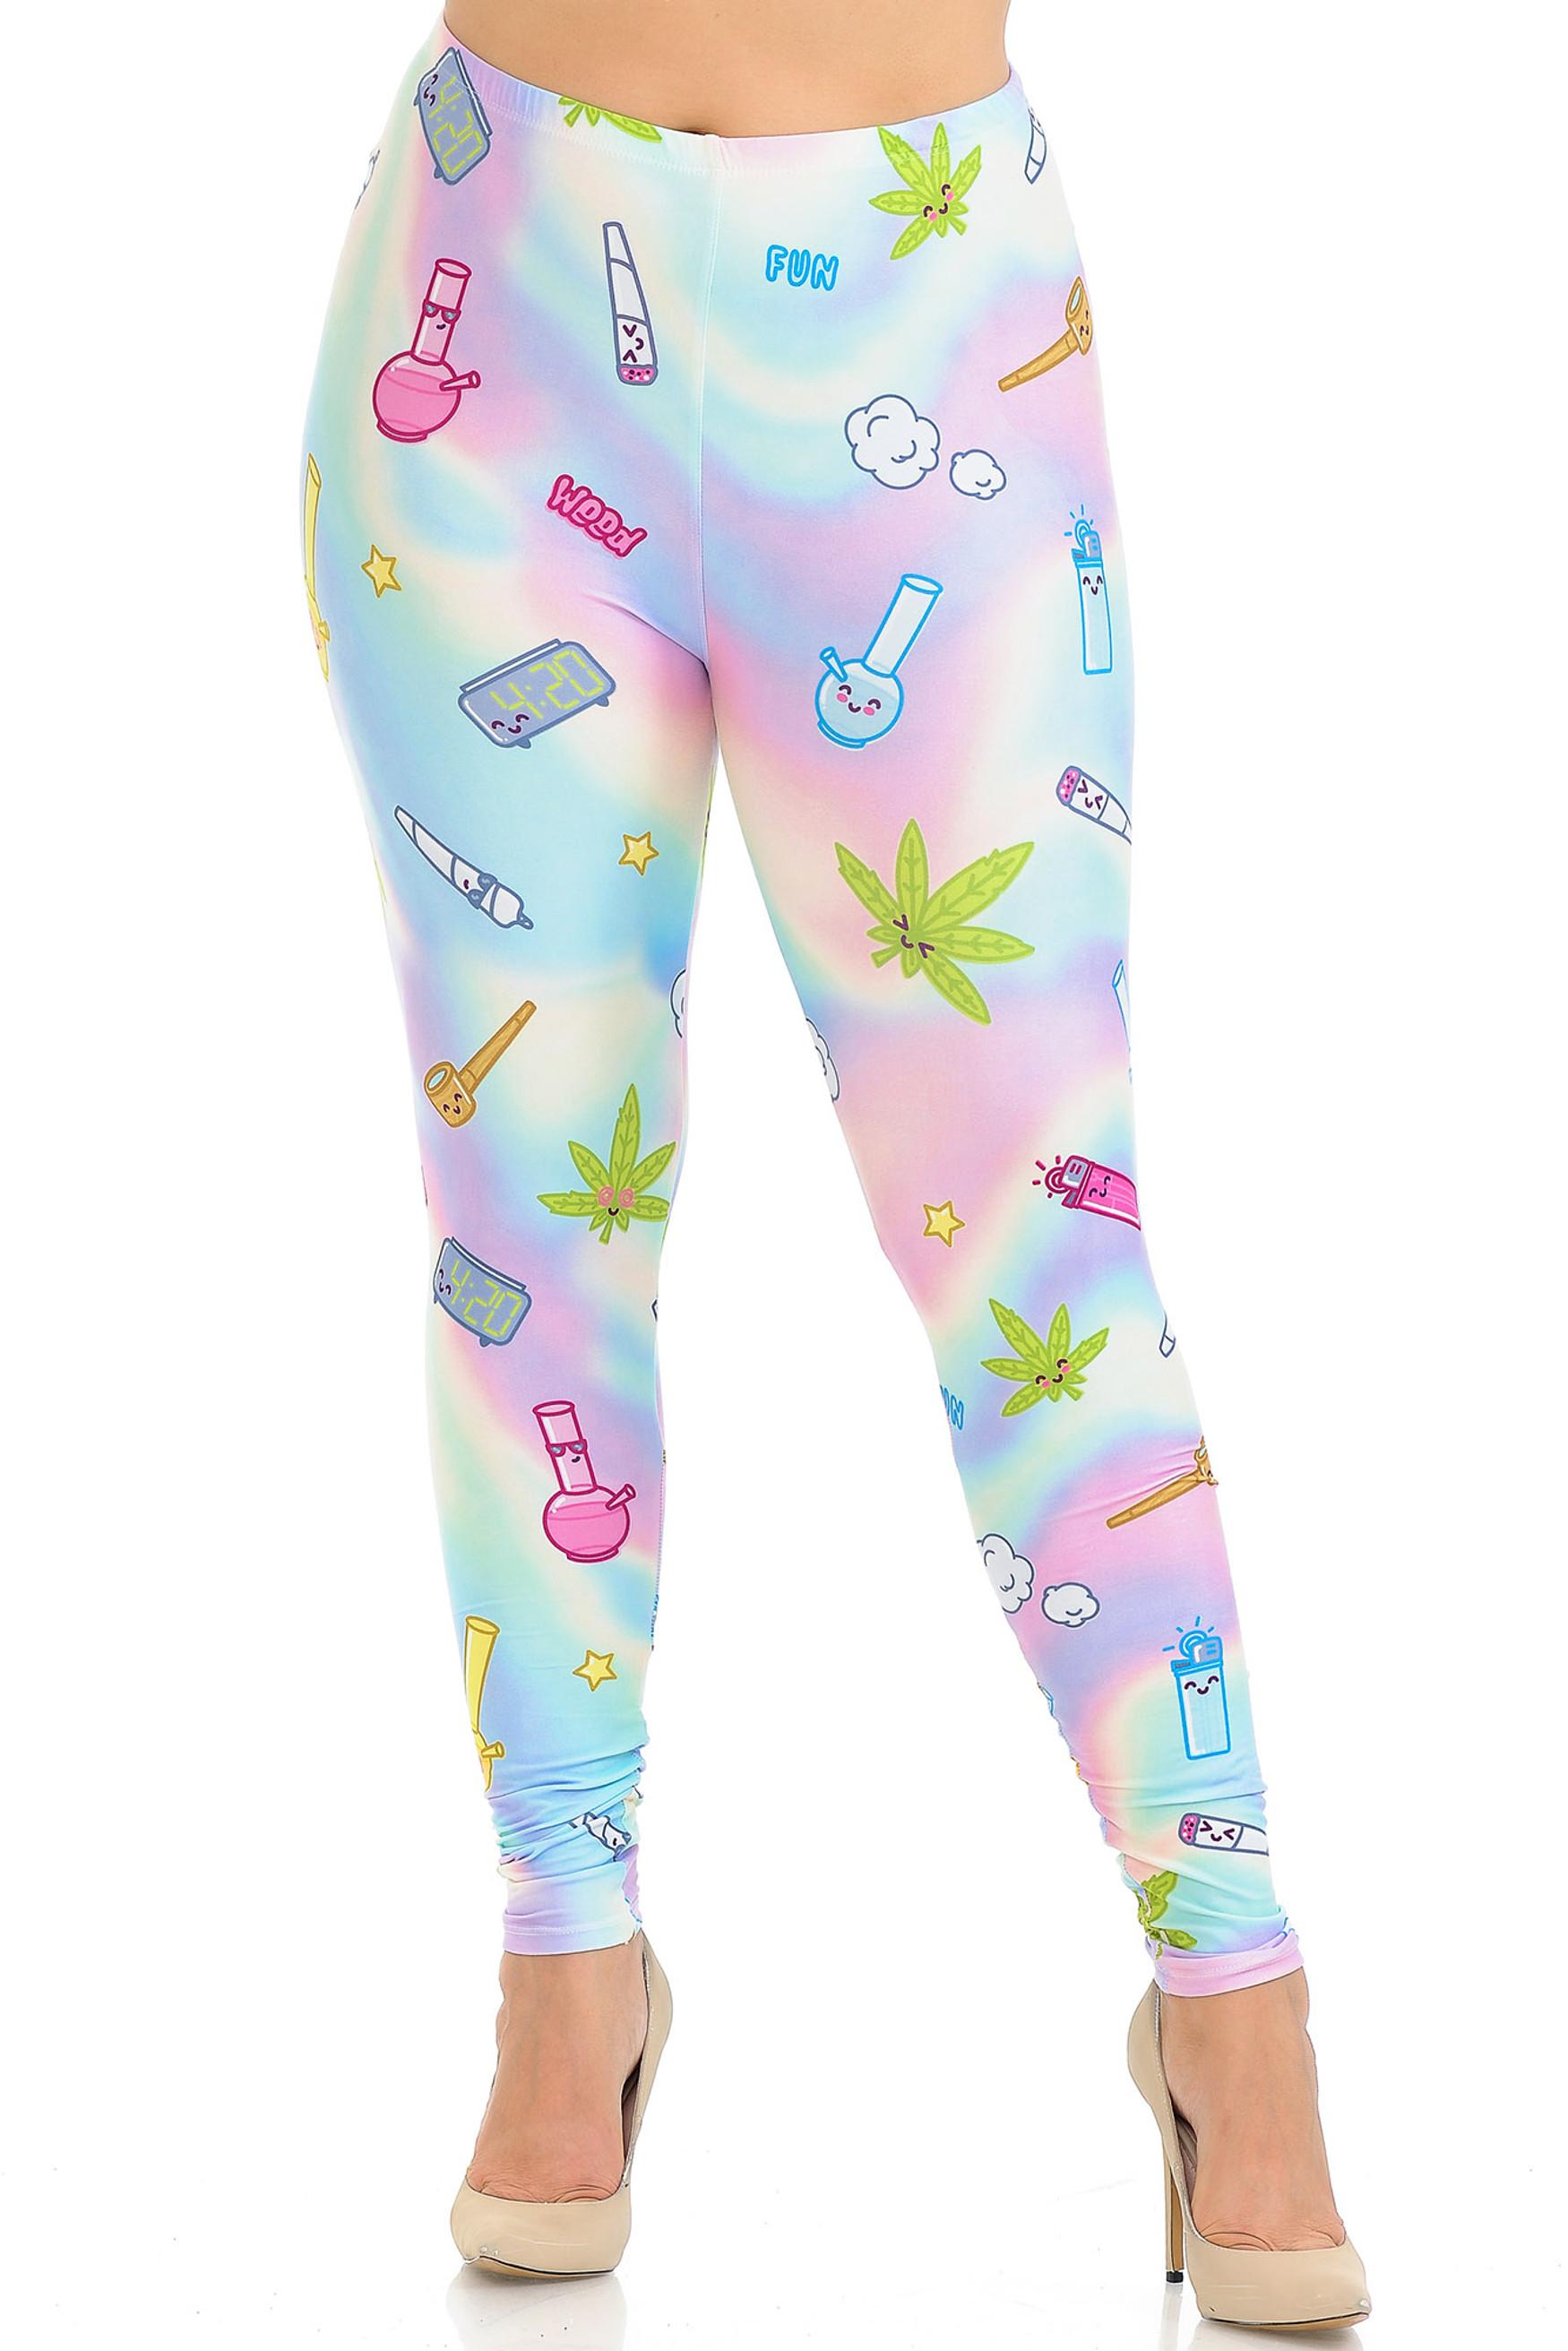 Creamy Soft Marijuana Life Plus Size Leggings - USA Fashion™